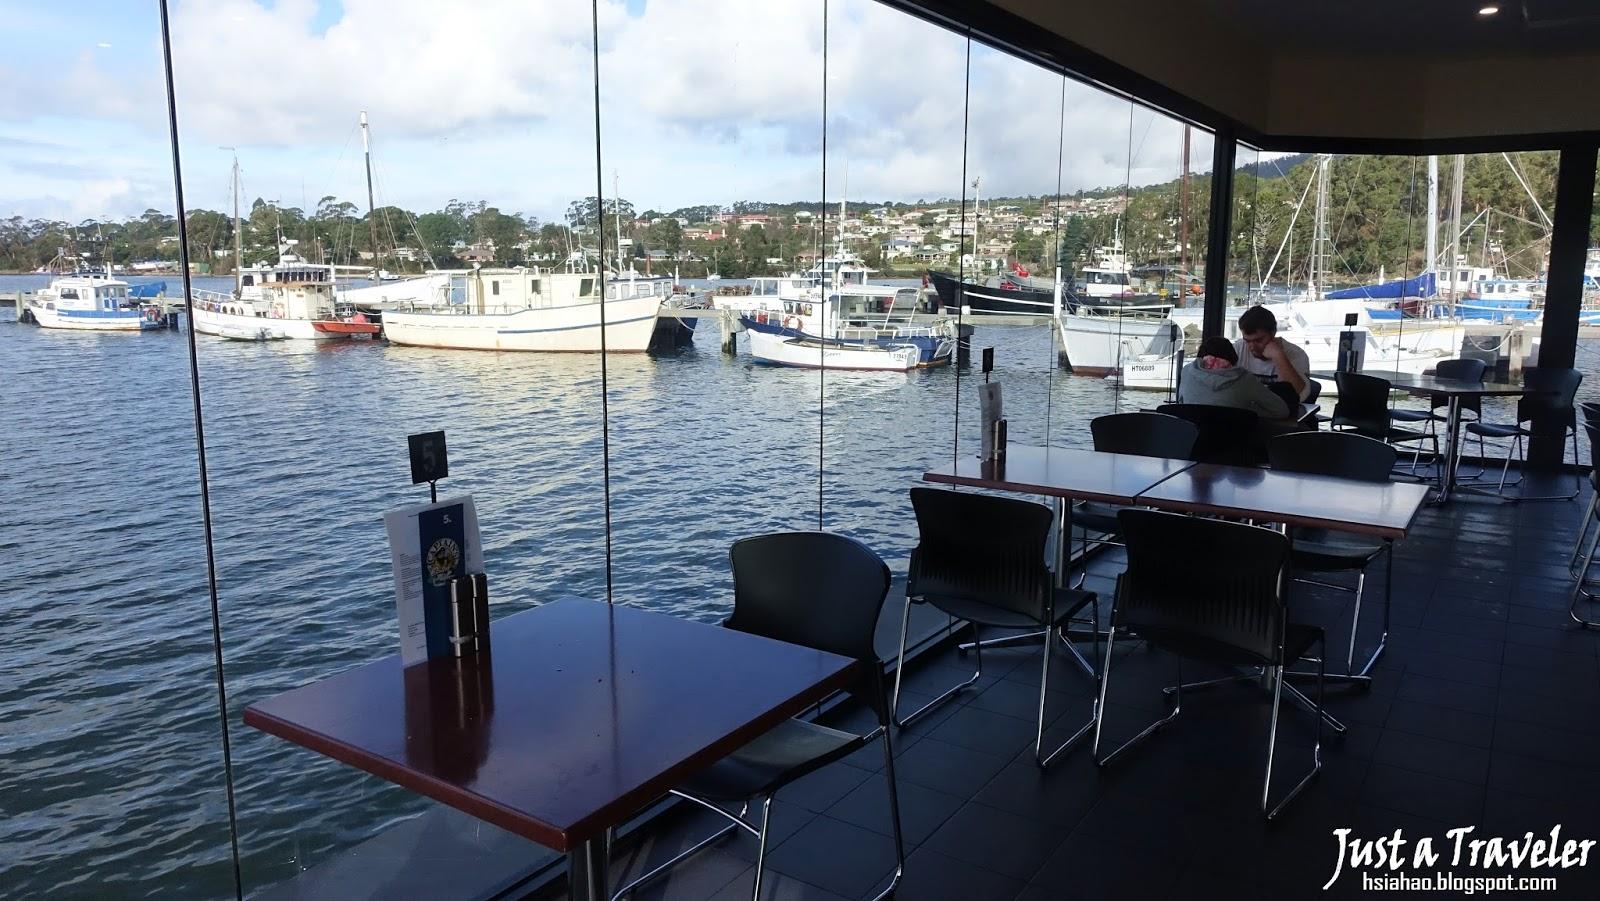 塔斯馬尼亞-景點-推薦-火焰灣-美食-旅遊-自由行-澳洲-Tasmania-Bay-of-Fires-Tourist-Attraction-Australia